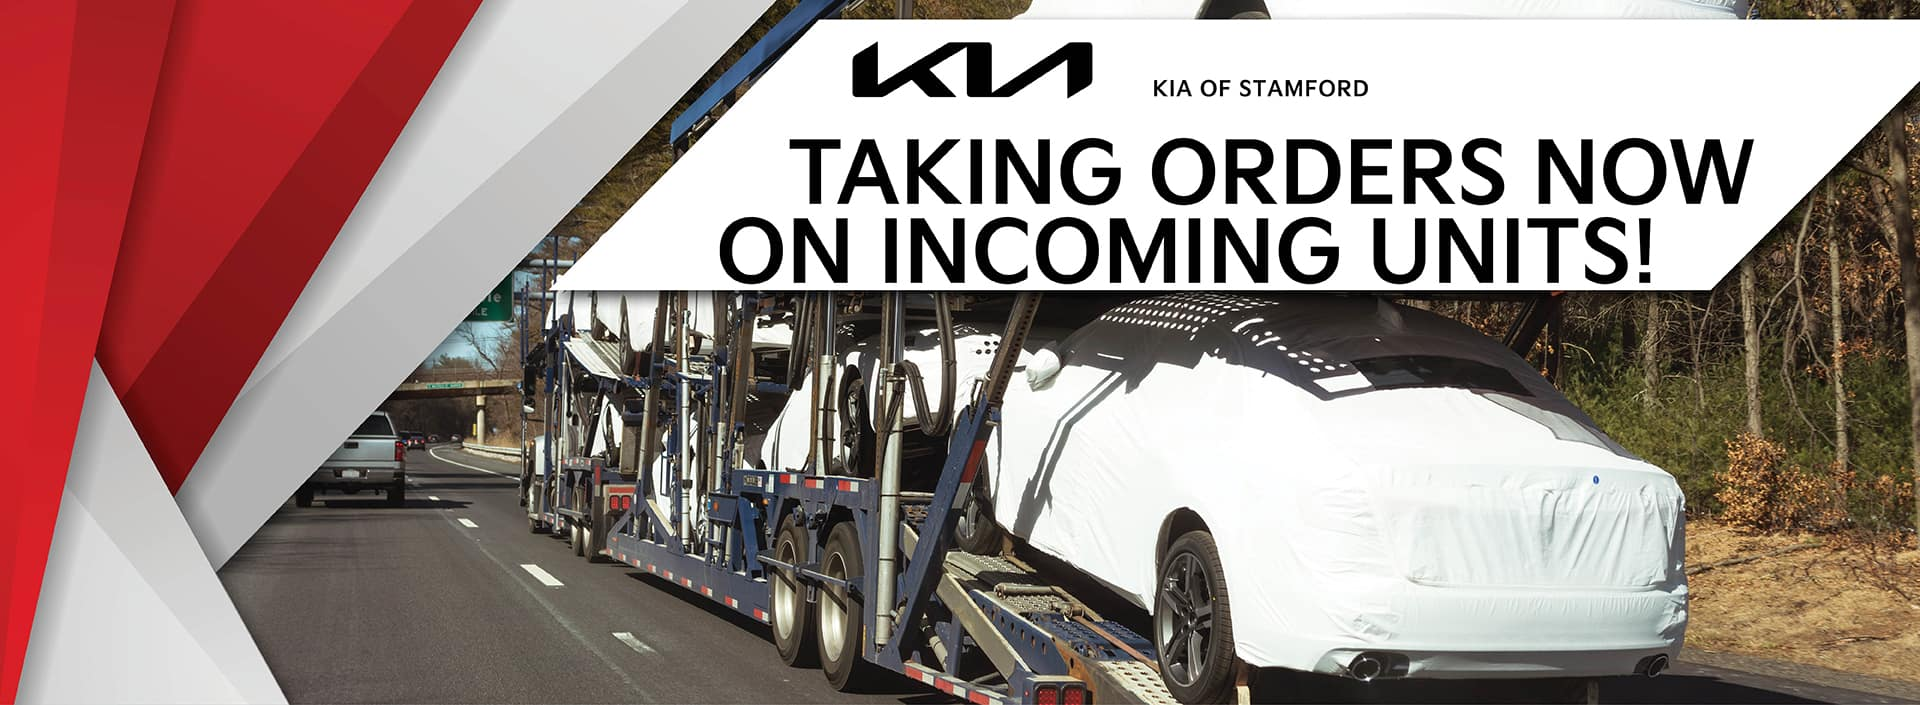 Taking Orders on Incoming Vehicles   Kia of Stamford